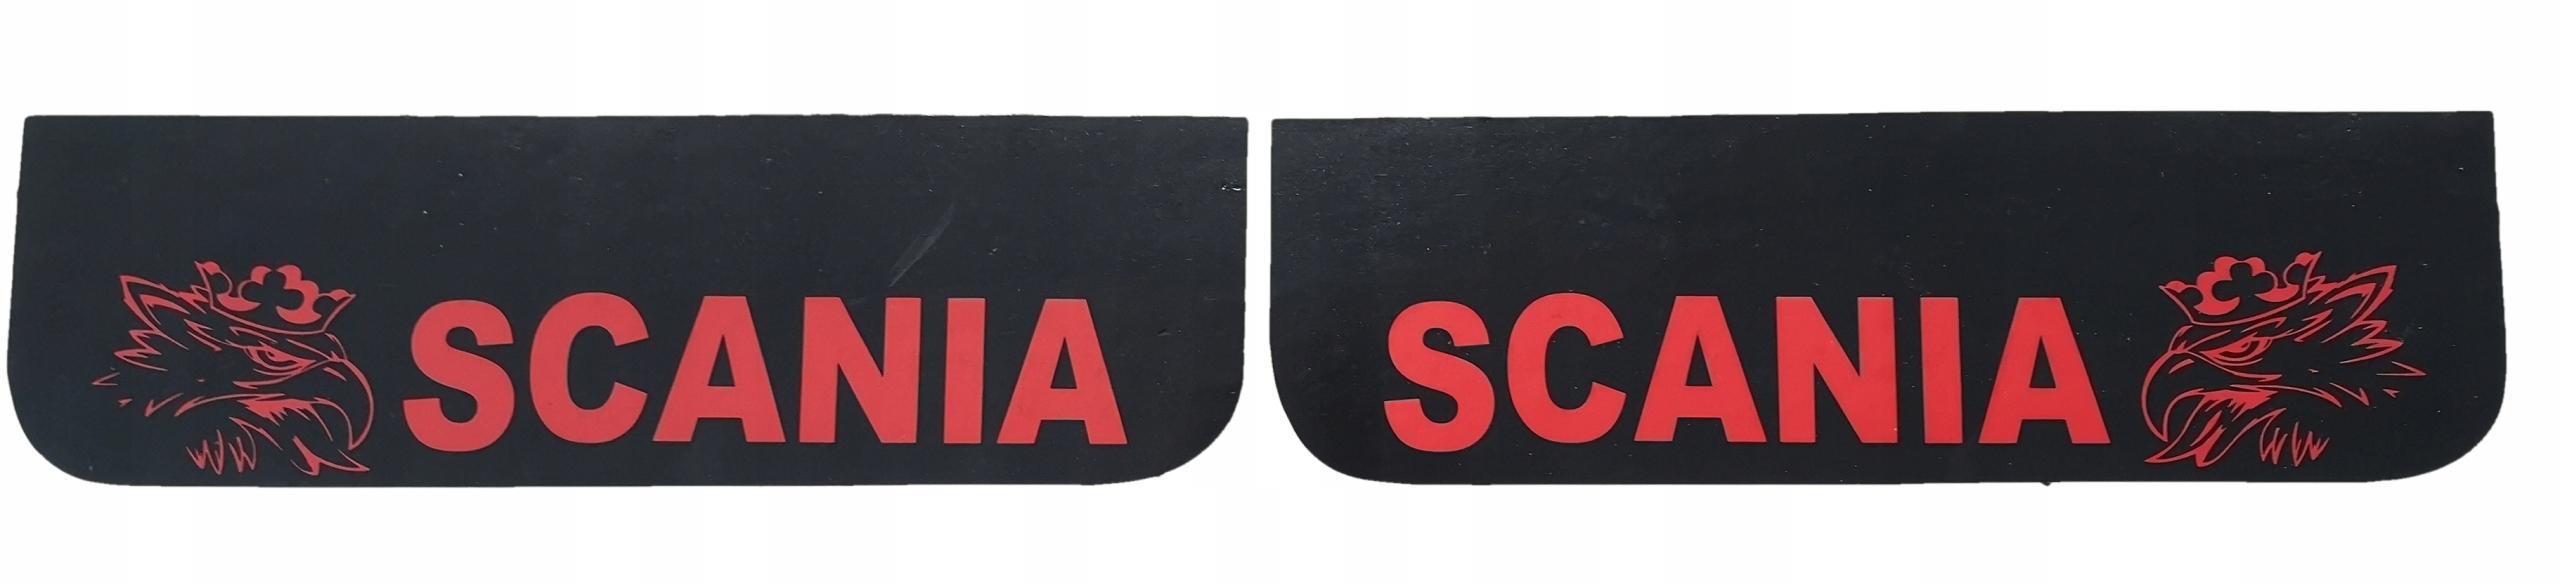 Фартук с брызговиками SCANIA logo ЦЕНА ДЛЯ 2 ШТ.